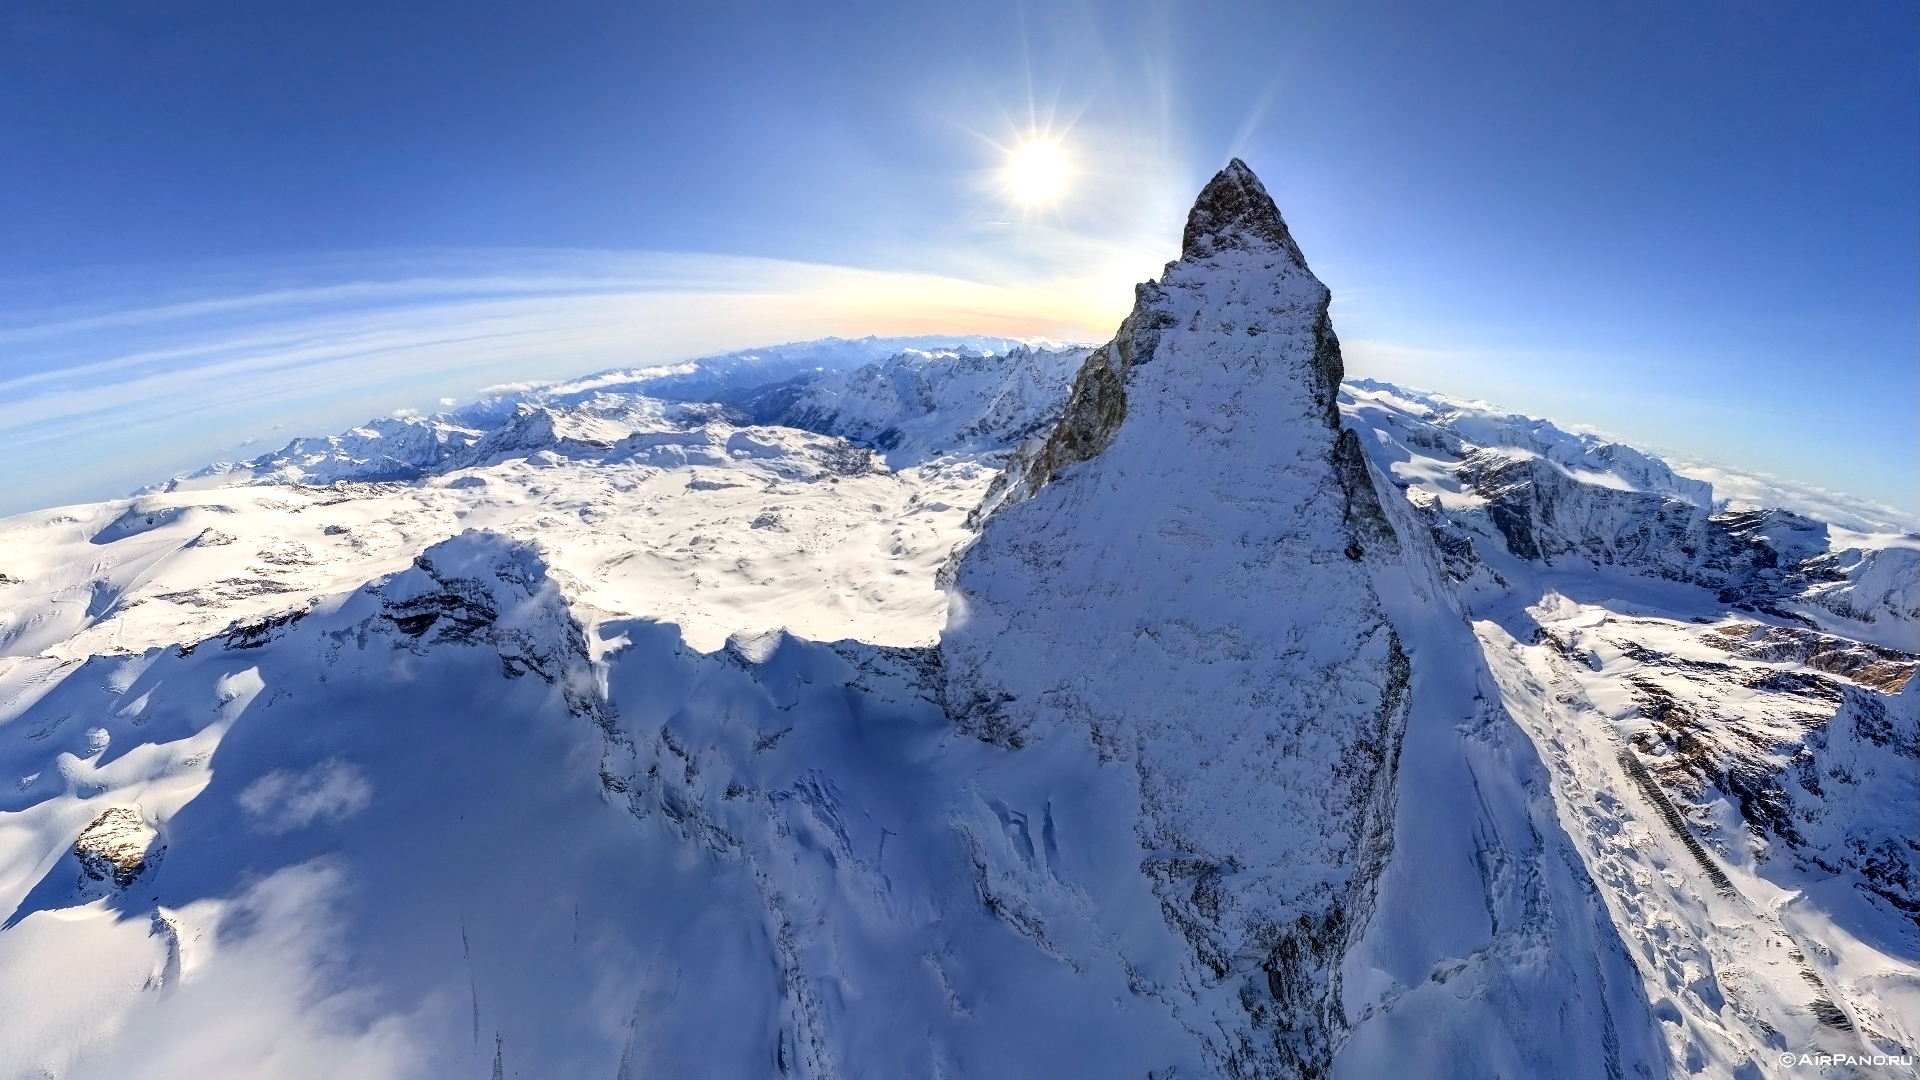 skiing wallpaper iphone 5